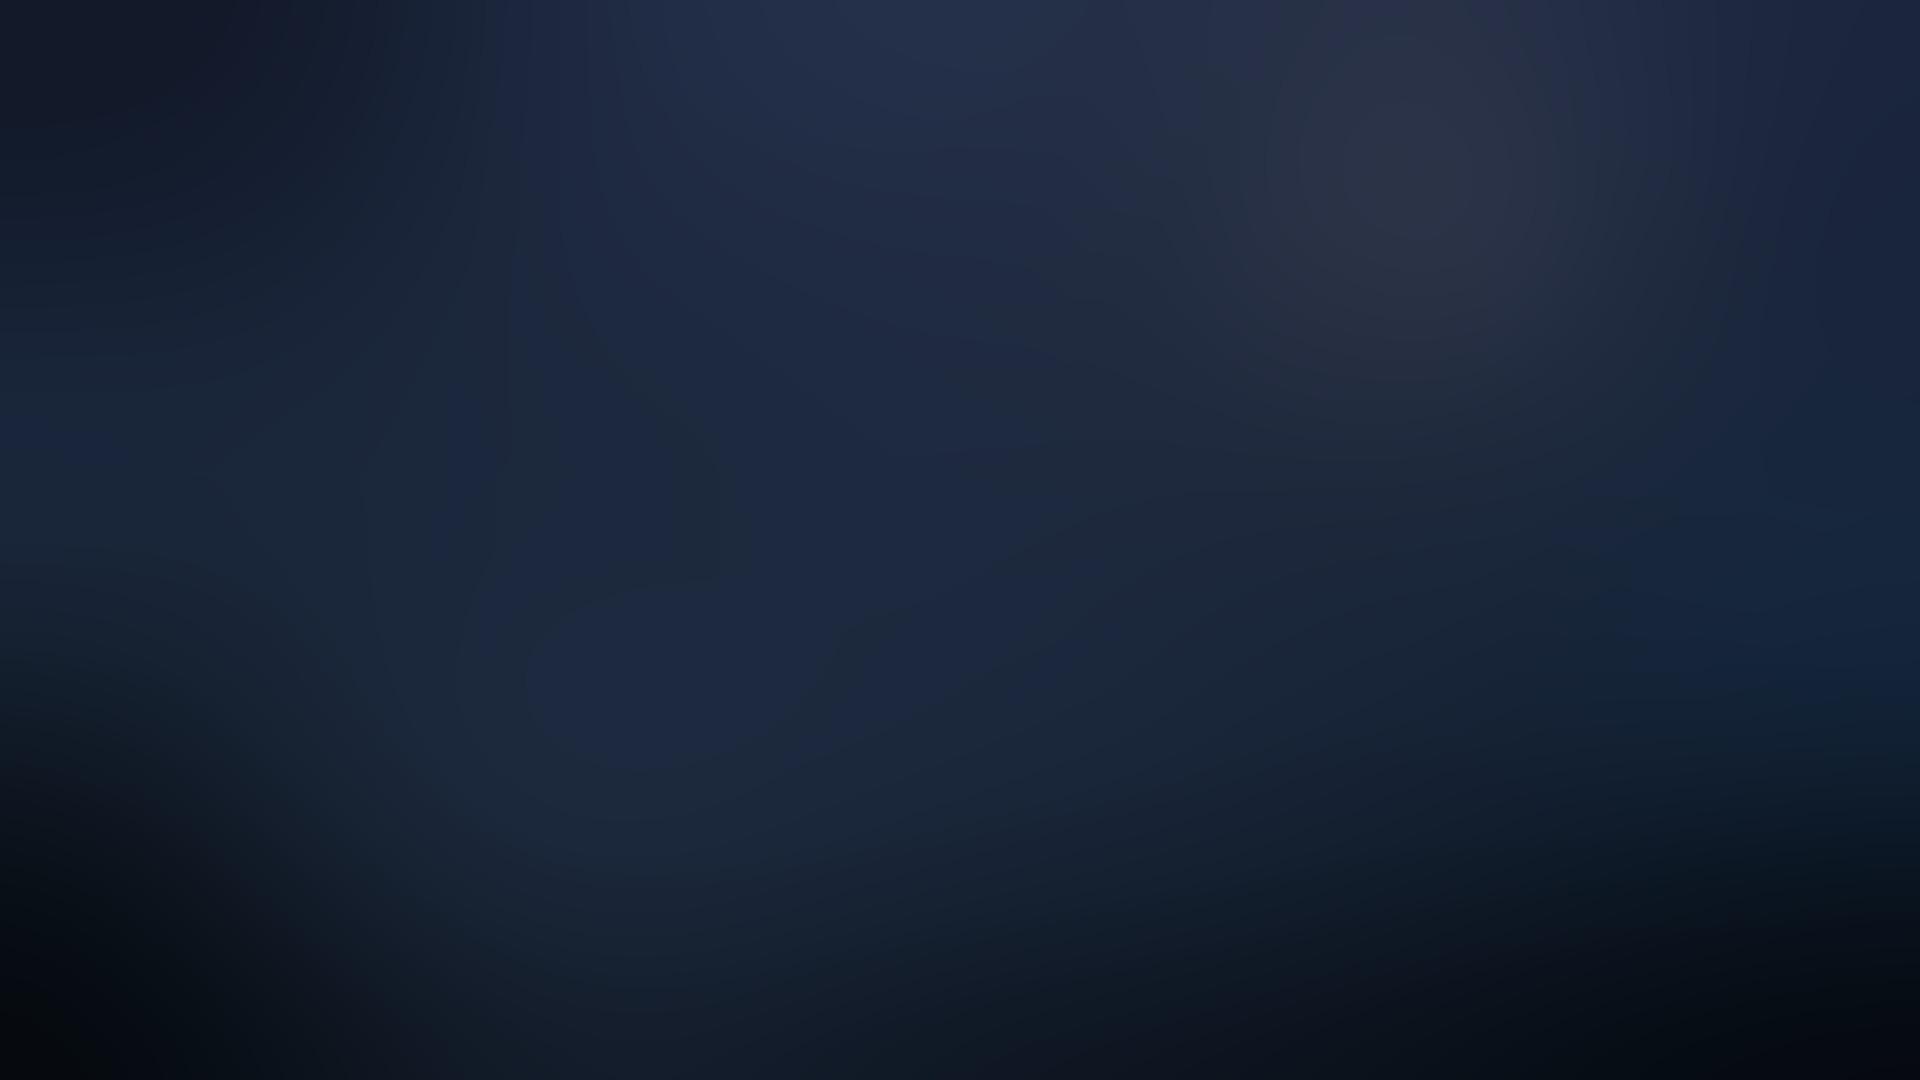 Blue Gradient Wallpaper Blue, Gradient #6541